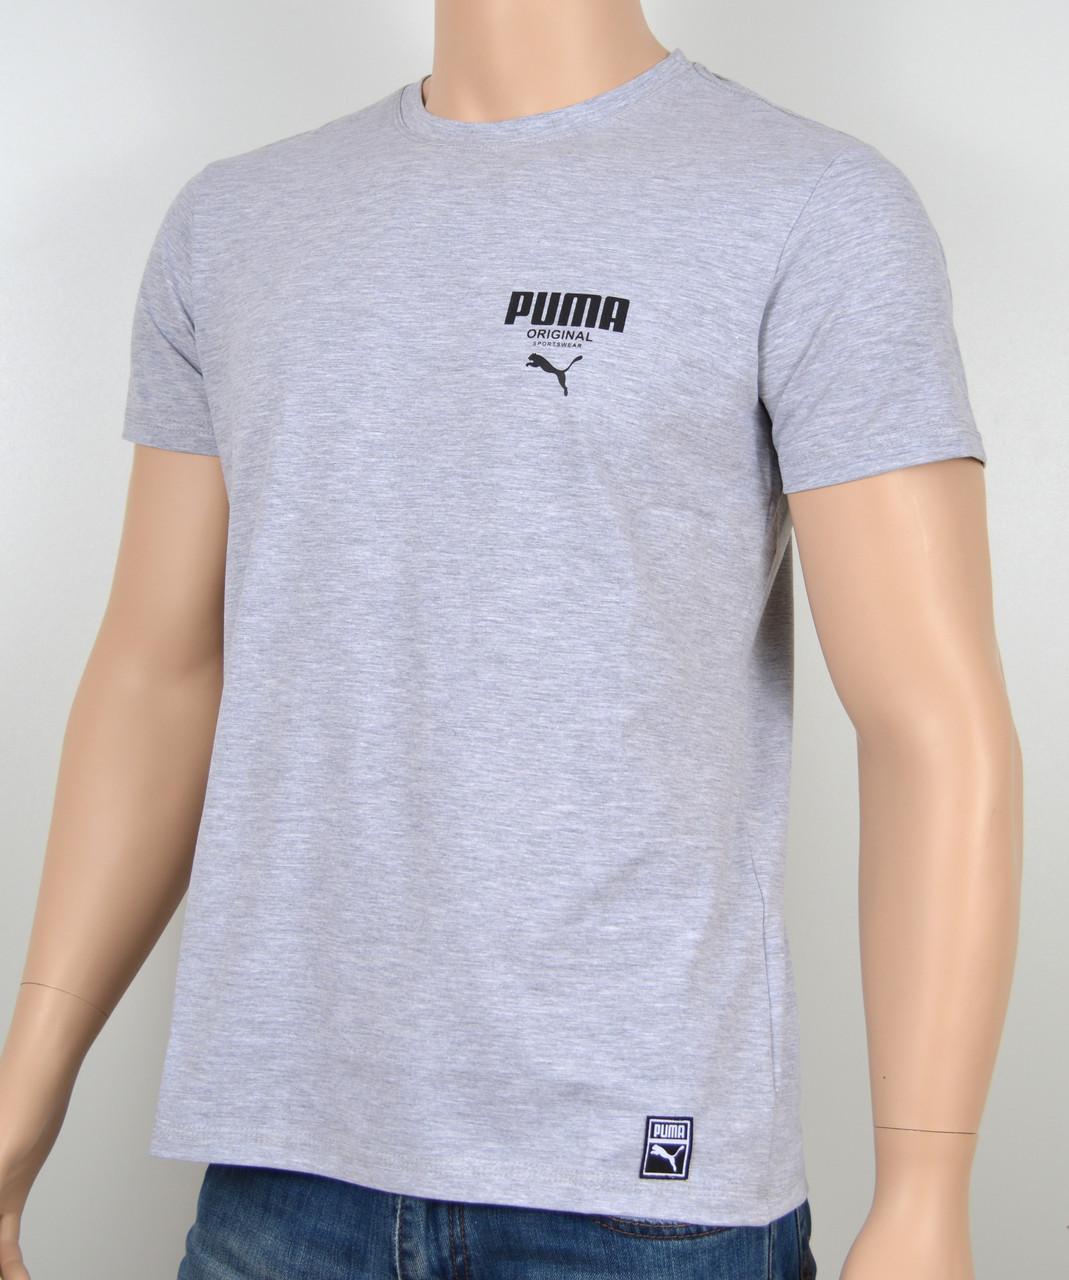 Футболки Puma оптом. PM1802 меланж